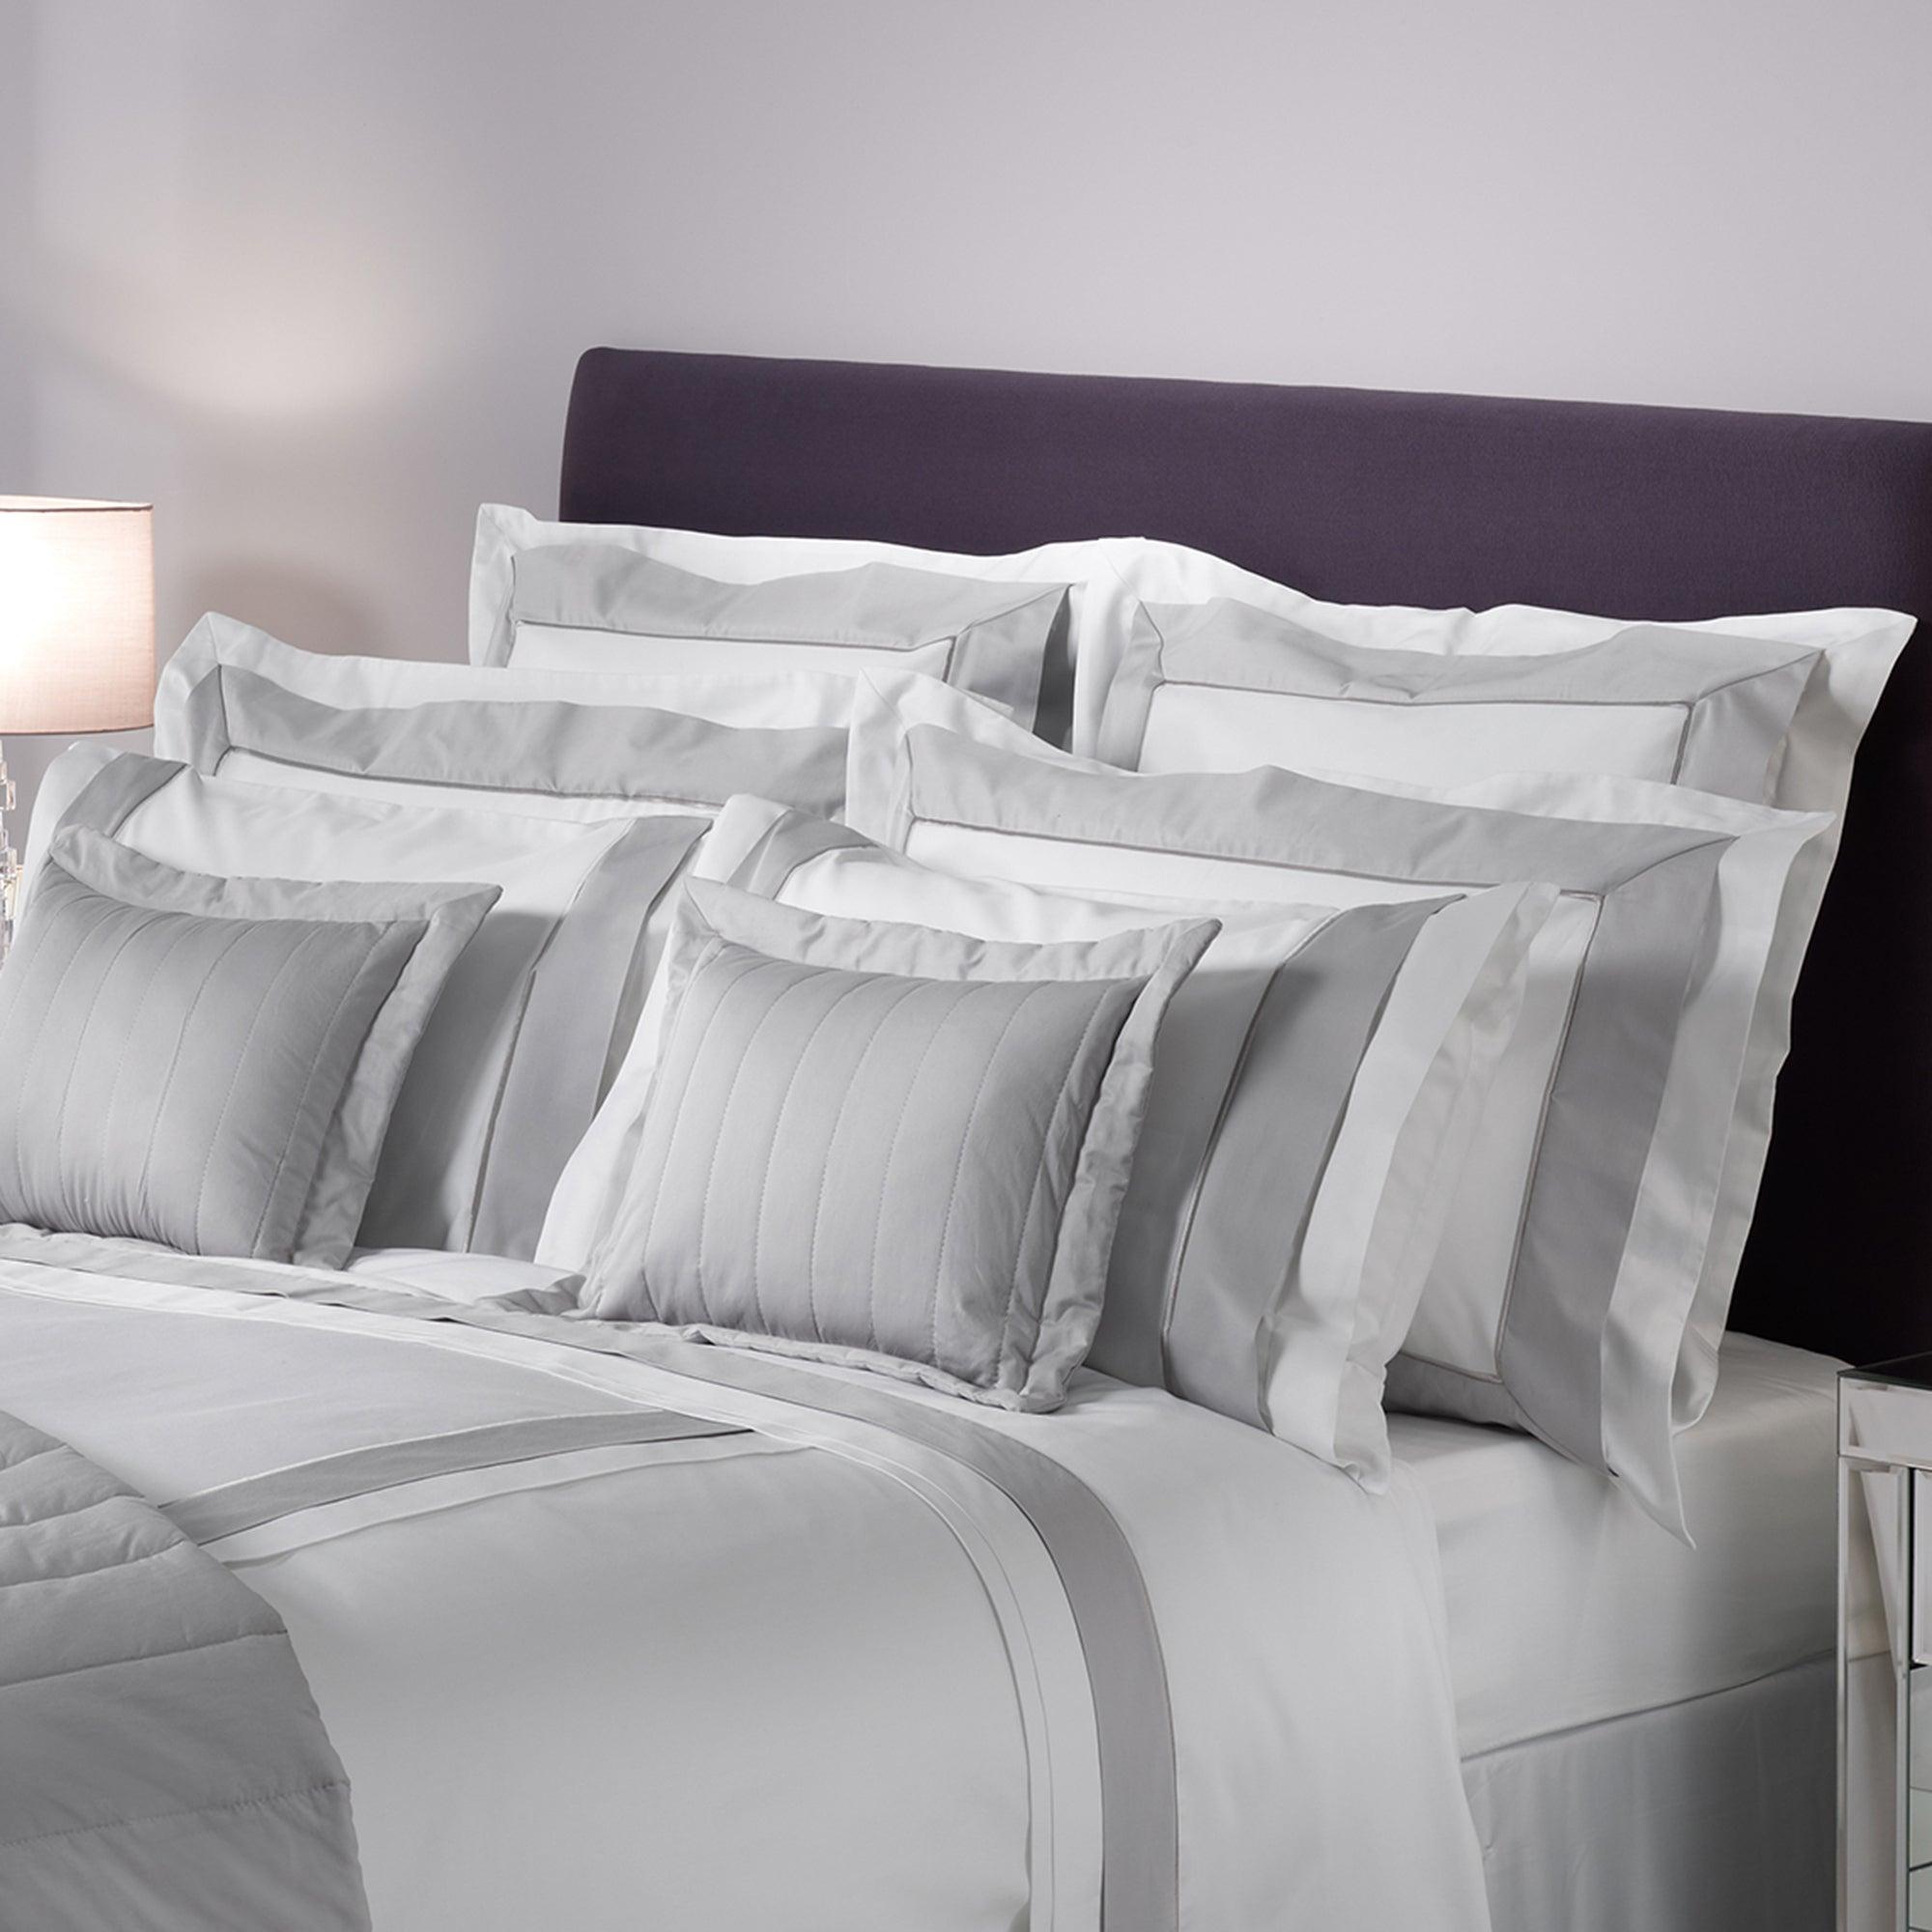 Champagne Hotel Hampton Collection Continental Pillowcase